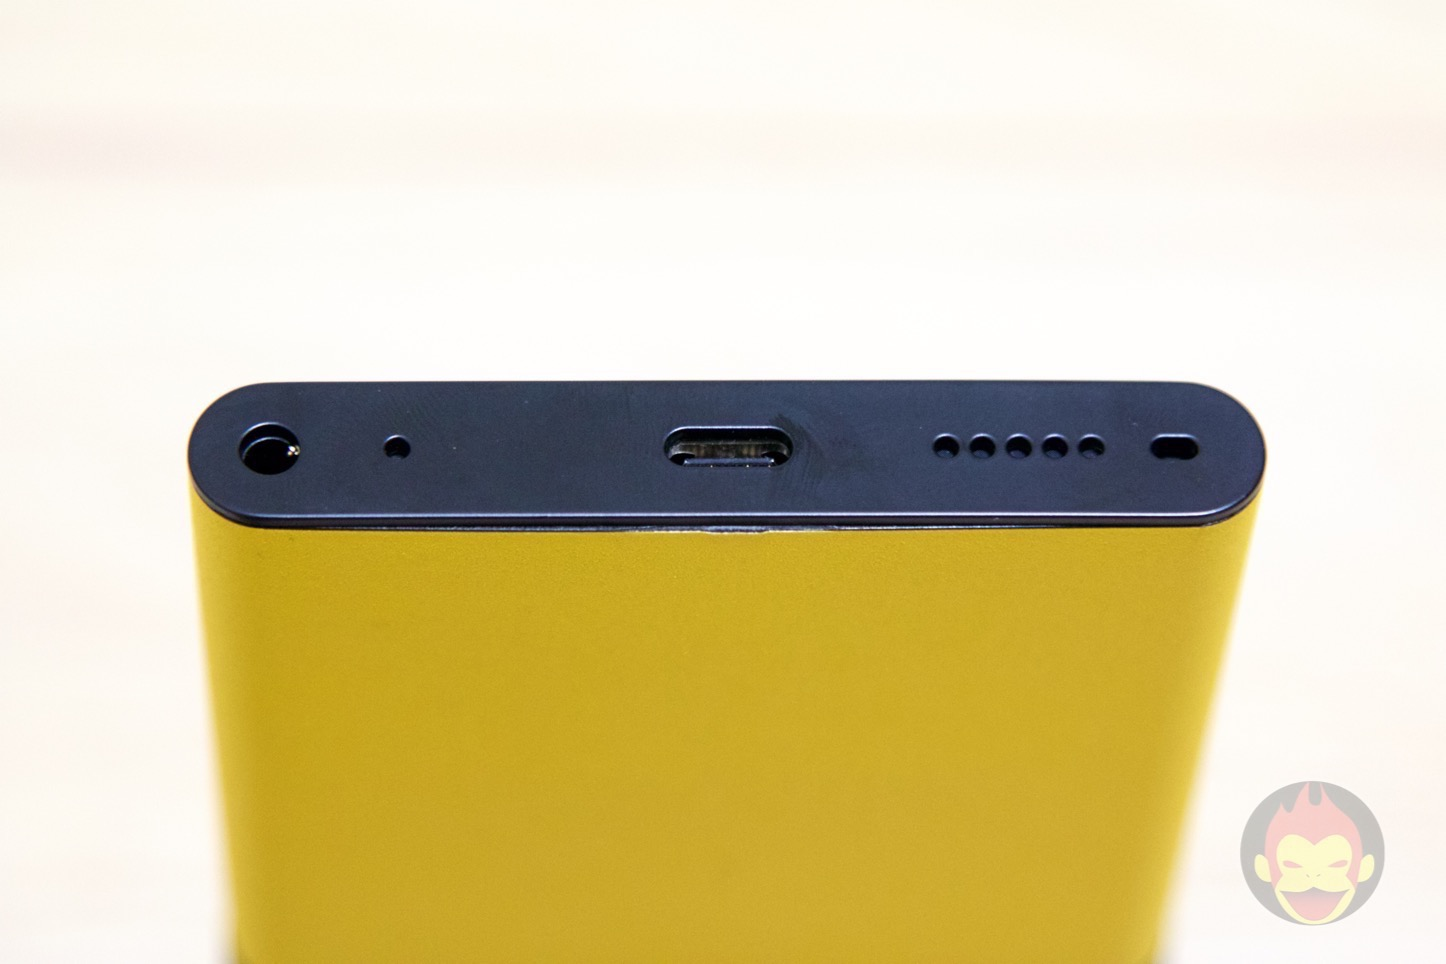 NuAns-Neo-Windows-10-Smartphone-0001.jpg